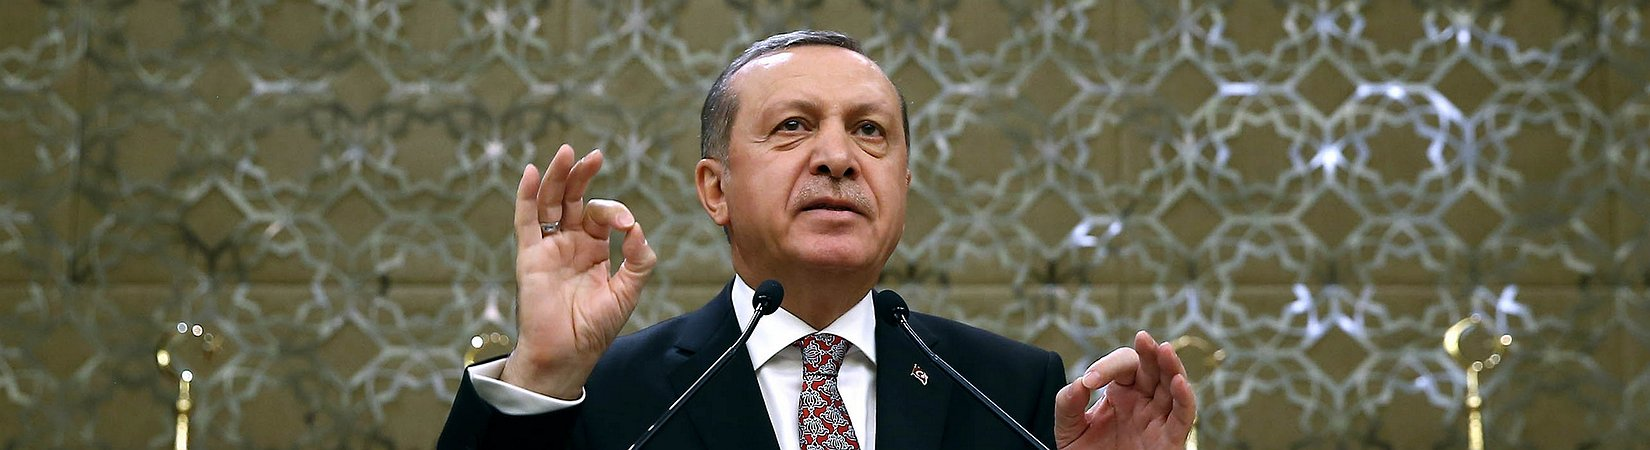 Türkei schwört Rache